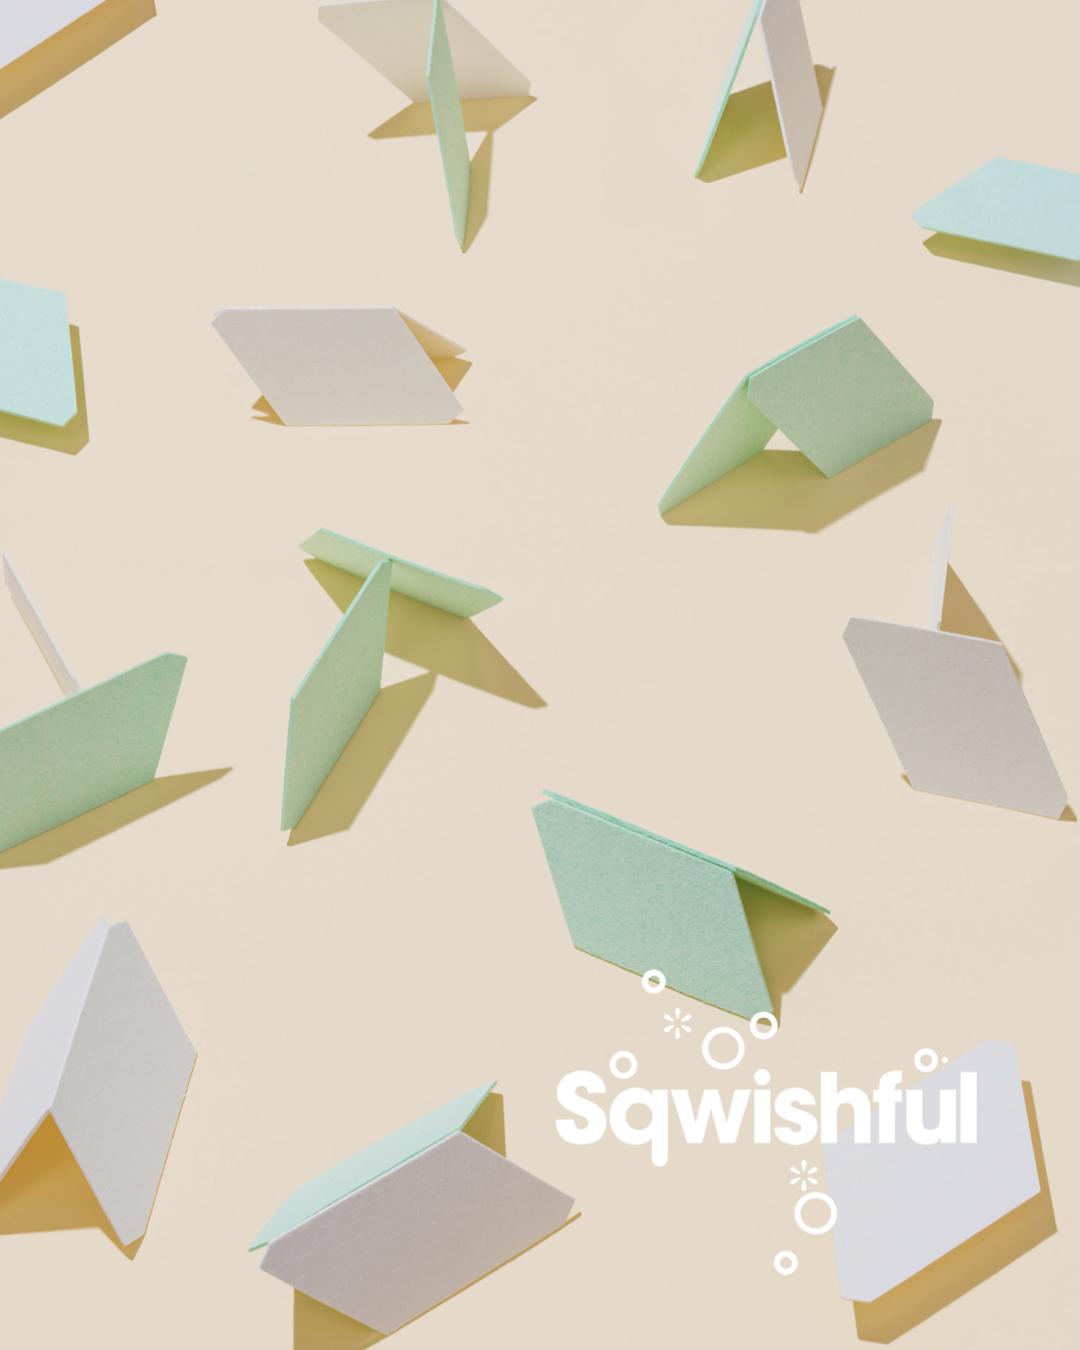 Sqwishful CDS East 2019.001.jpeg